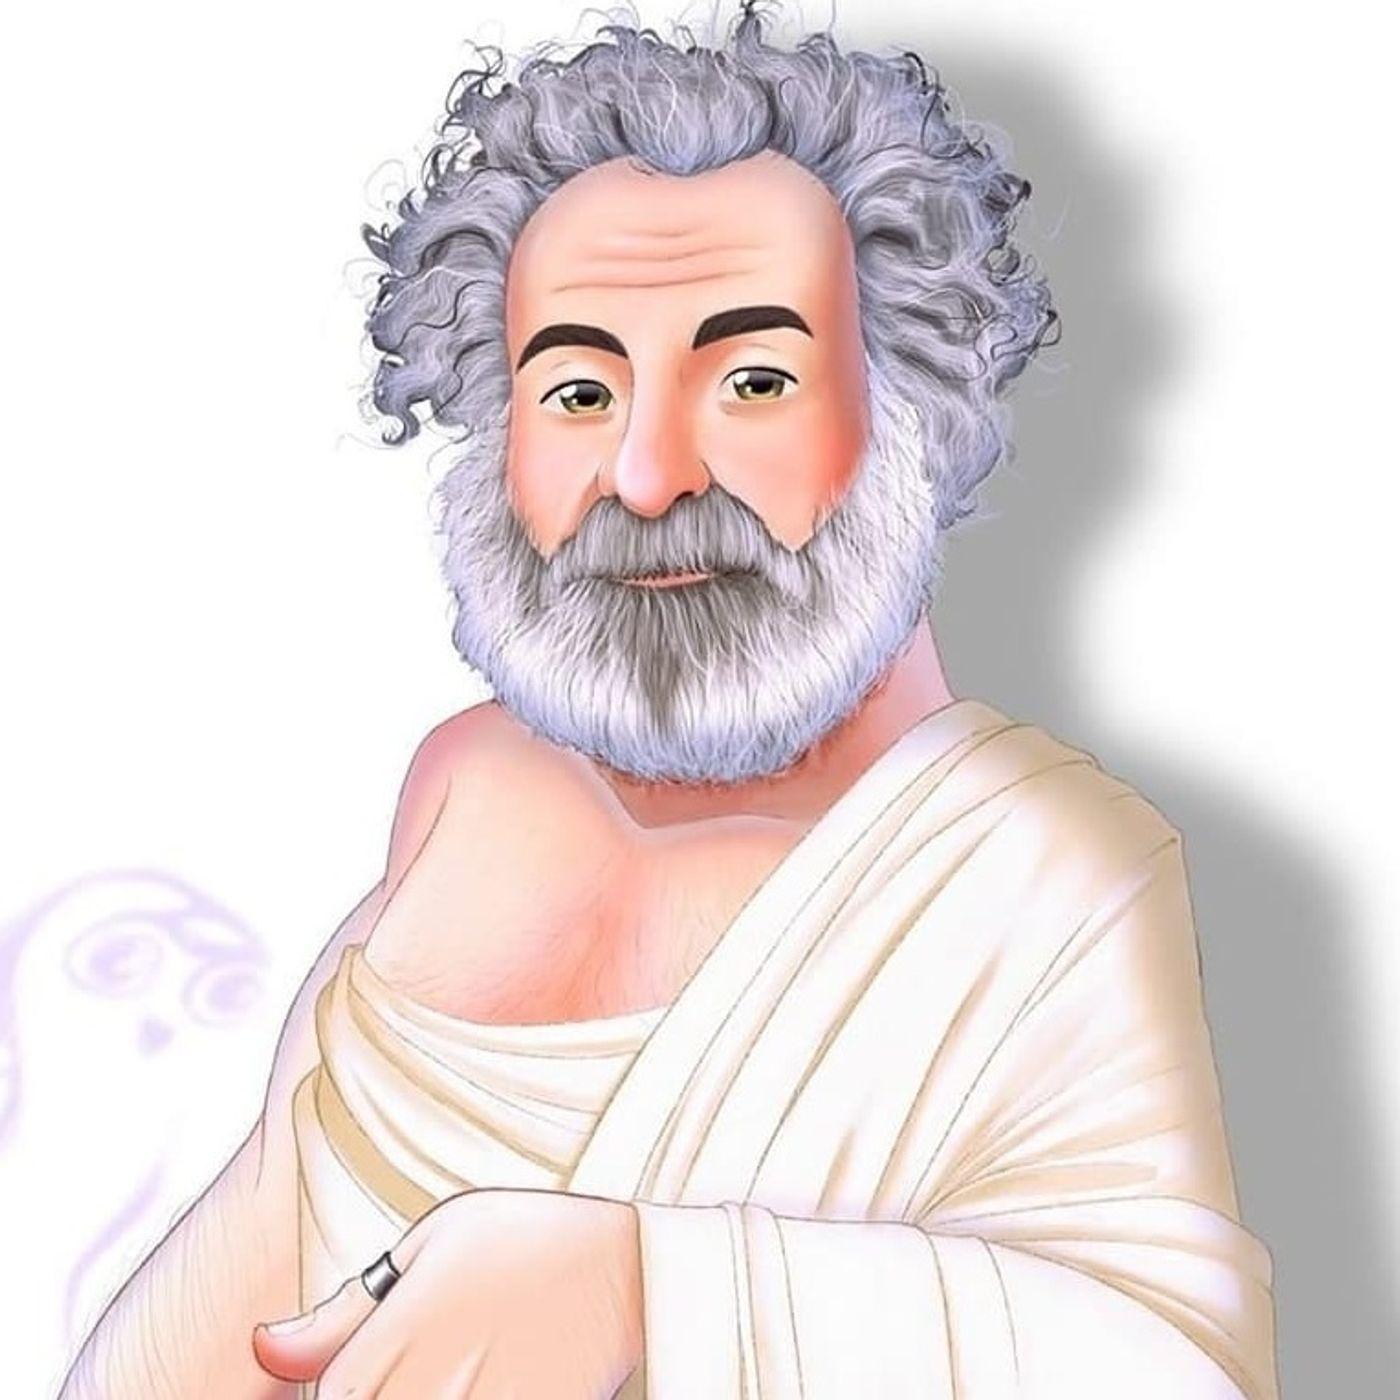 La filosofia tardoantica, con Matteo Saudino - ep. 73: speciale